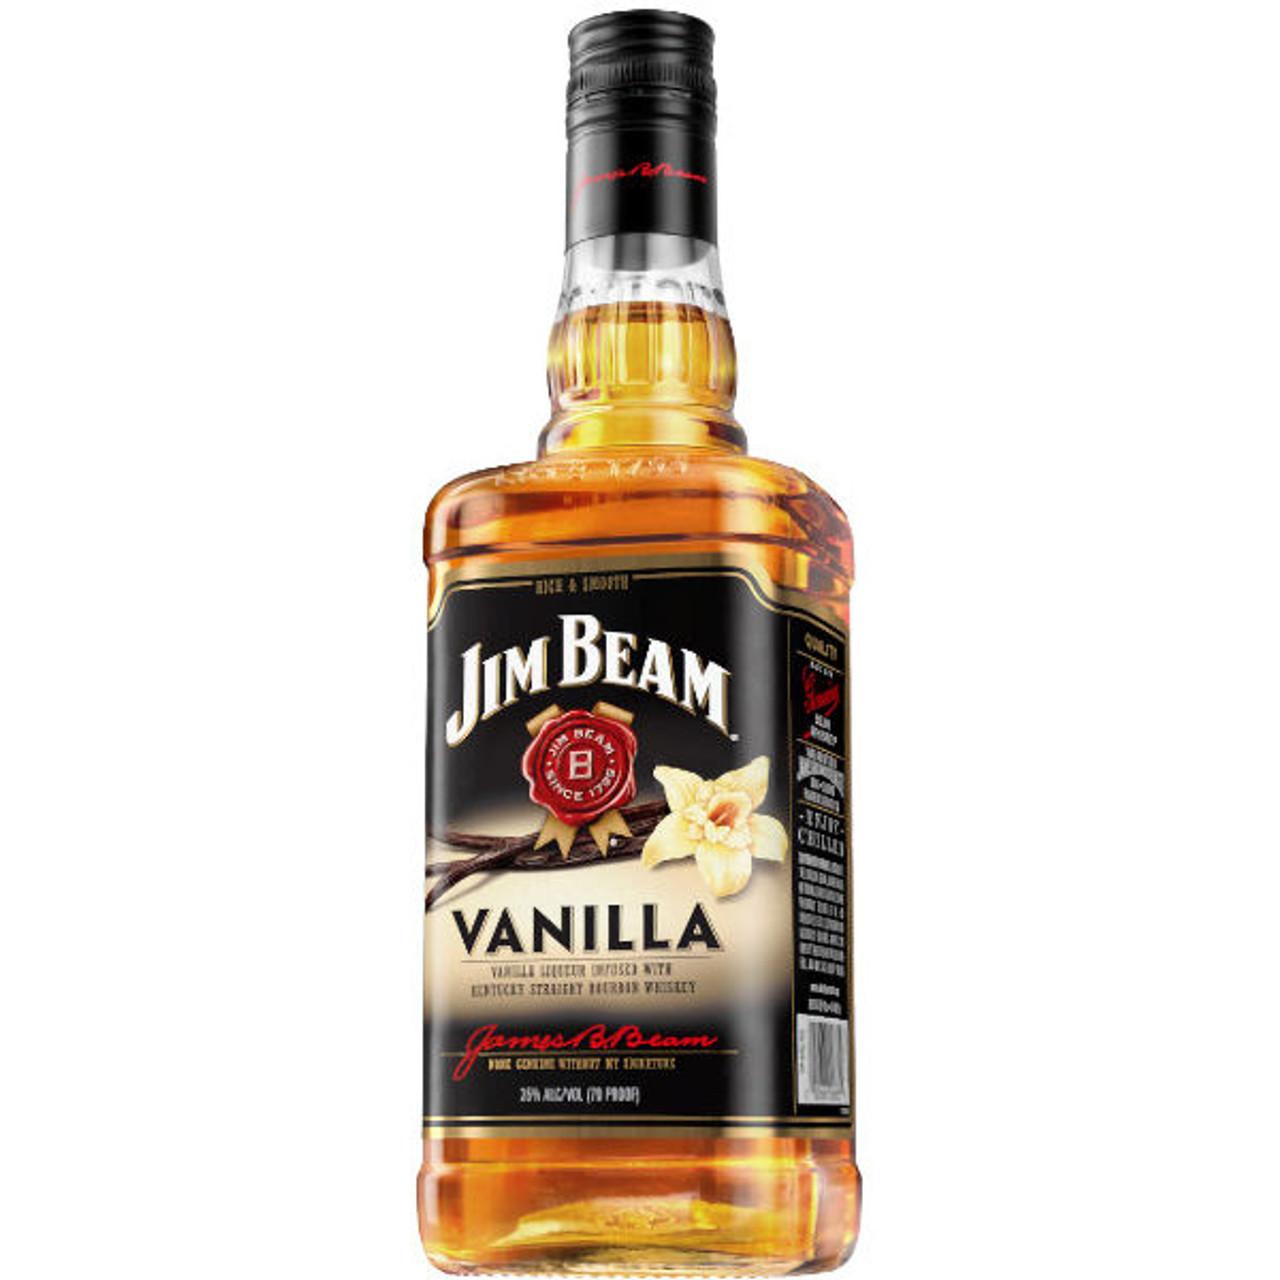 Jim Beam Vanilla Bourbon Liqueur 750ml